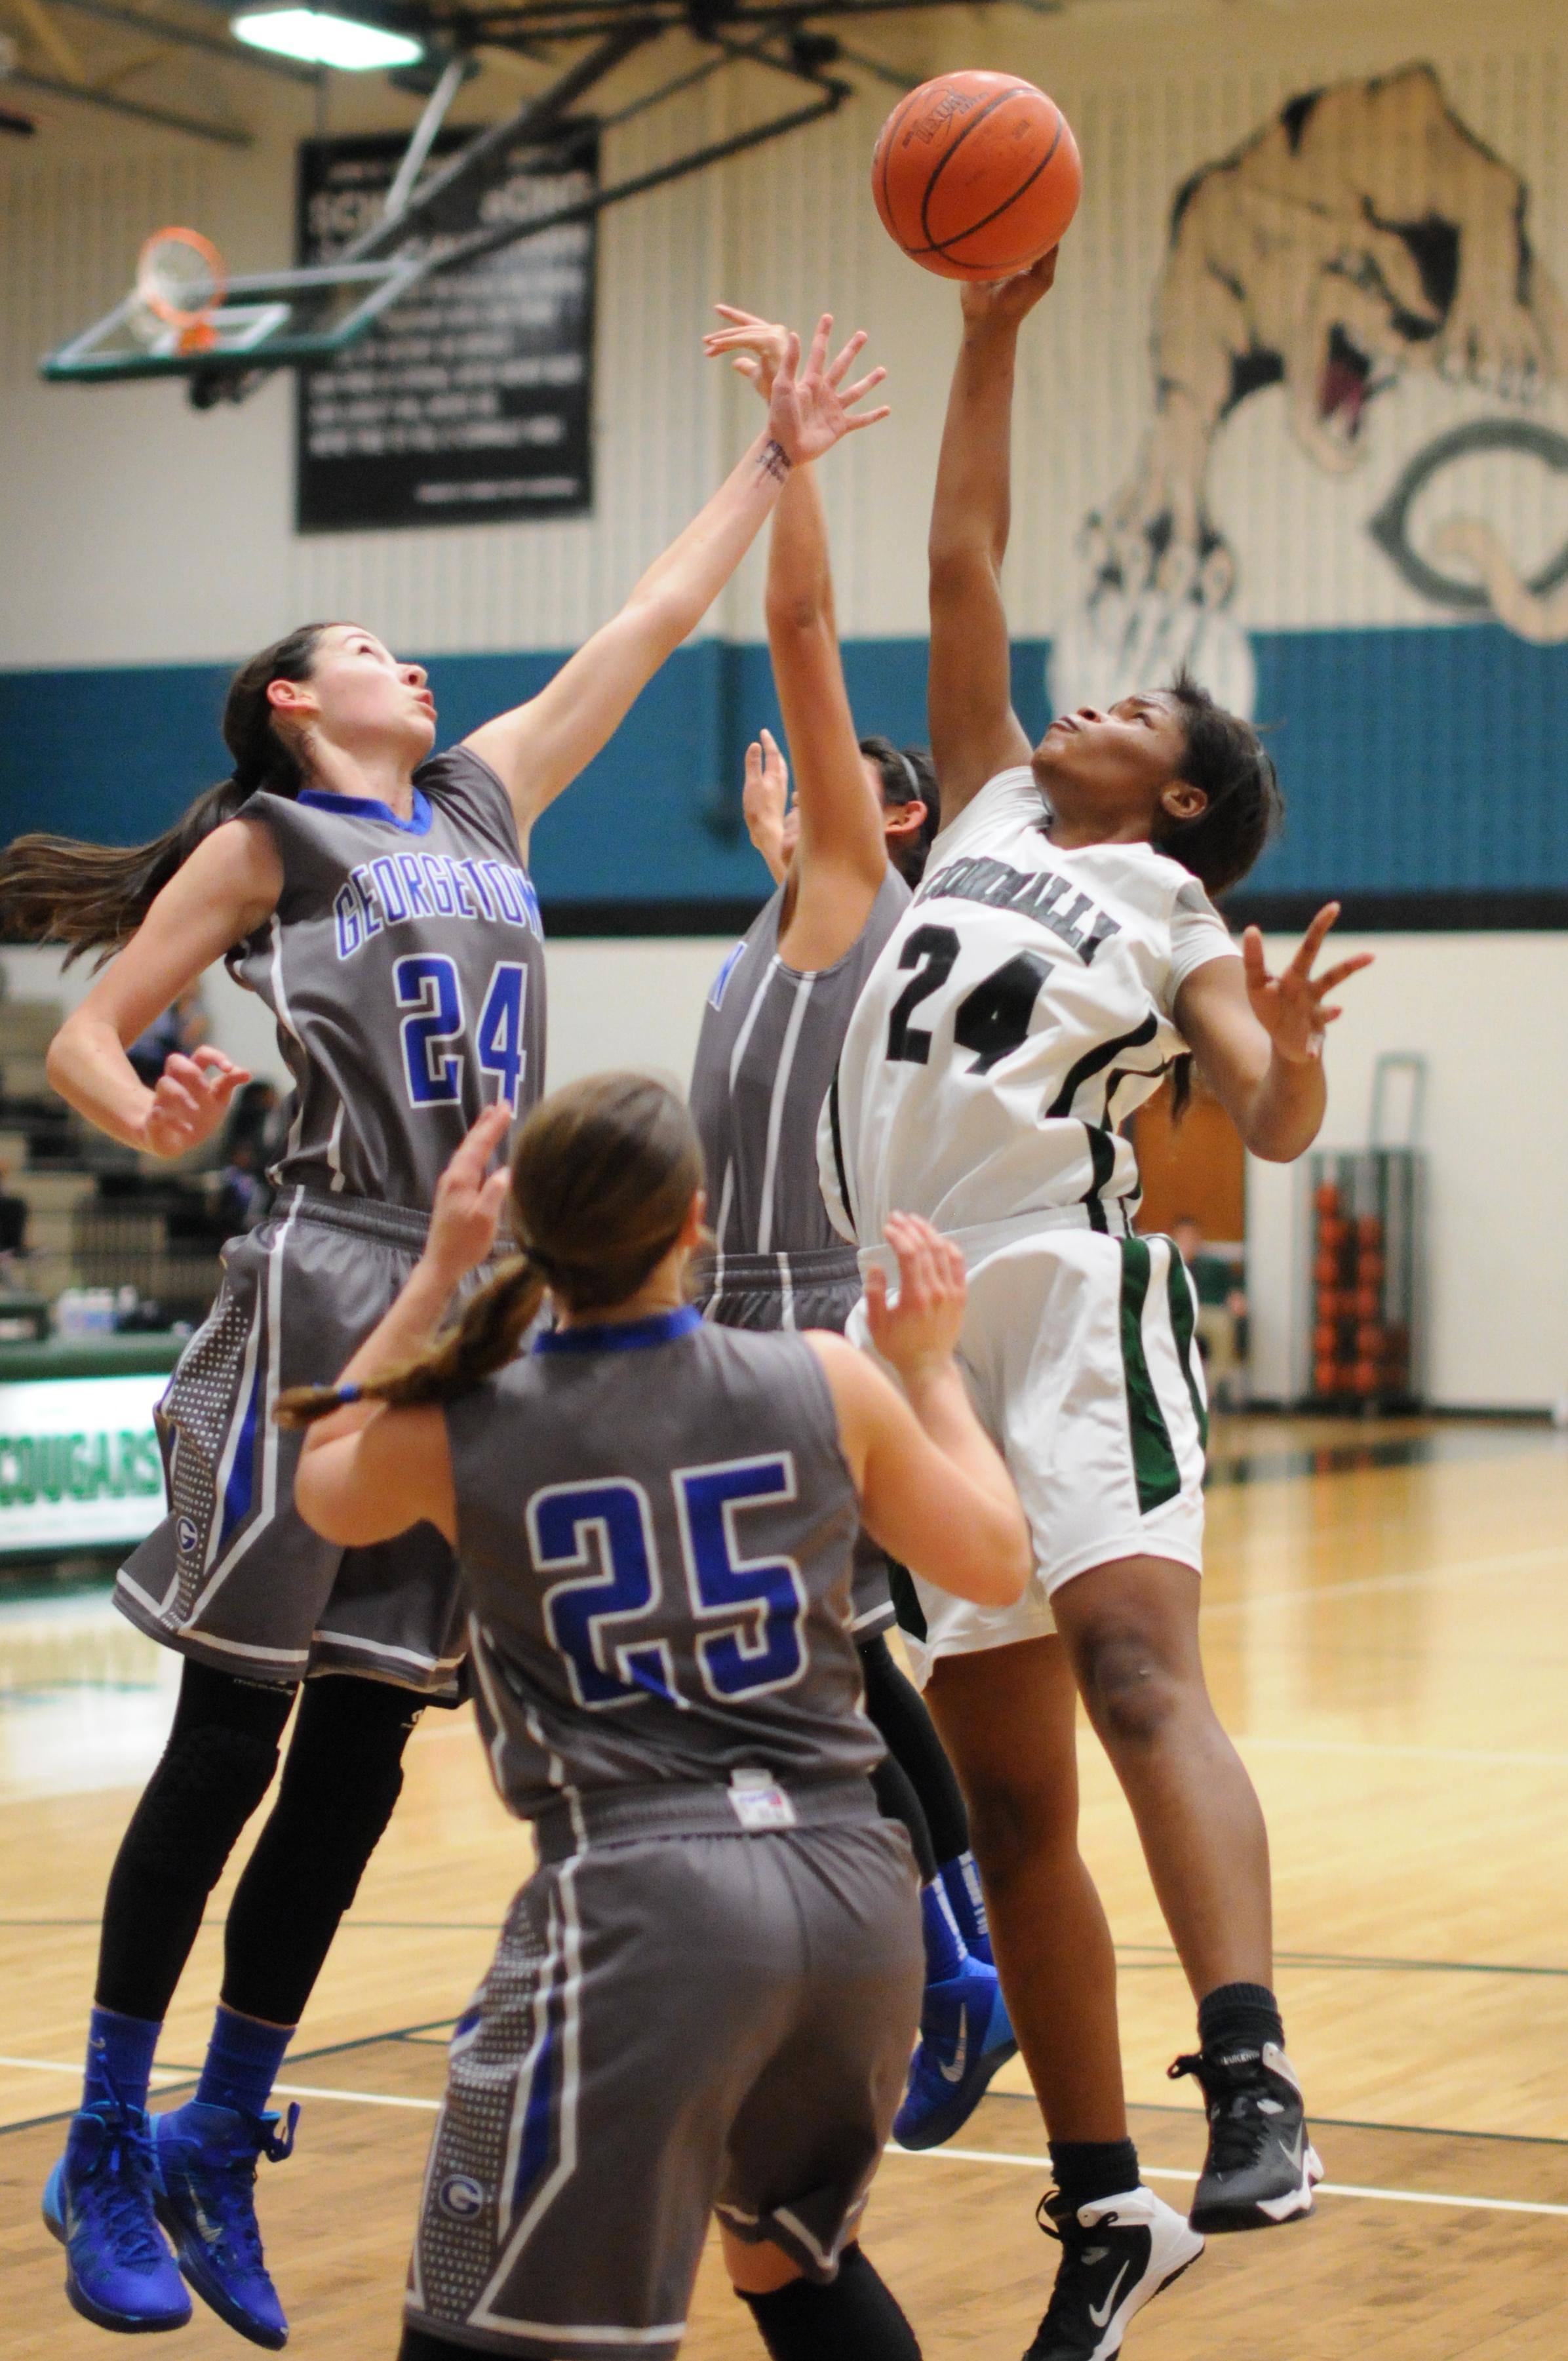 20140131_Connally_Girls_Basketball_v_Georgetown-0234.jpg